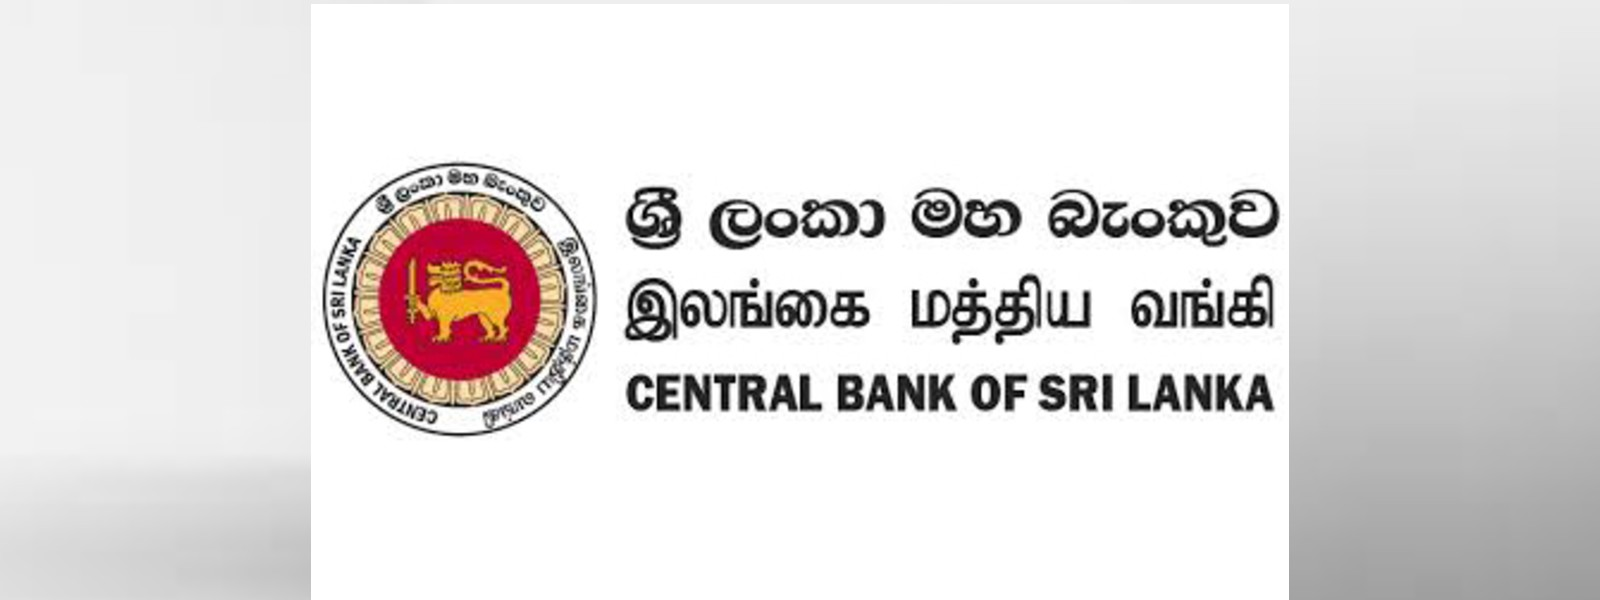 Sri Lanka's trade deficit widens further amidst coronavirus